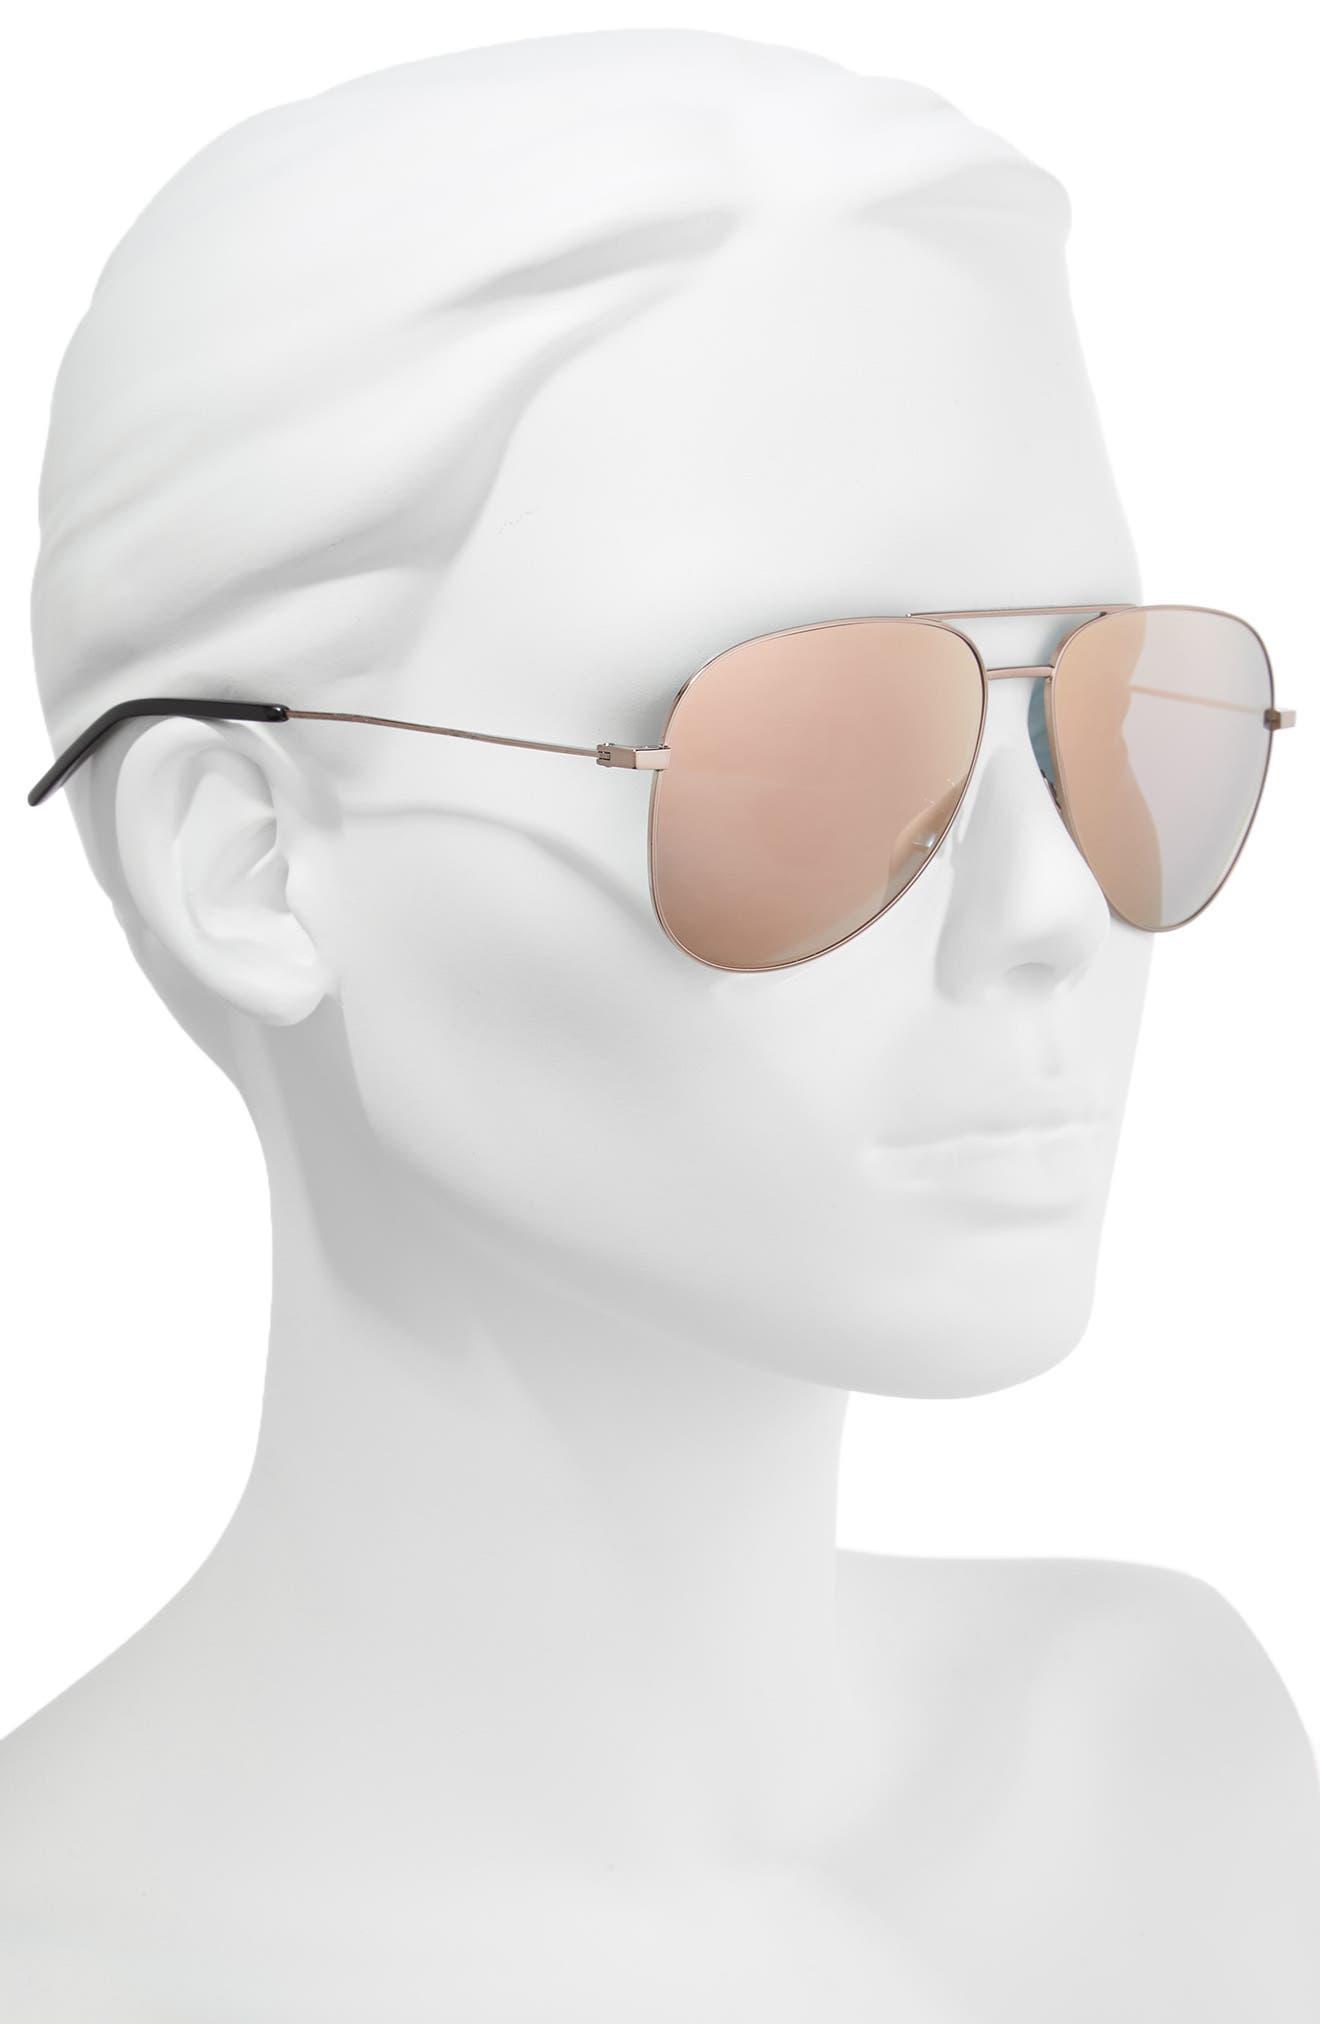 59mm Brow Bar Aviator Sunglasses,                             Alternate thumbnail 2, color,                             Champagne